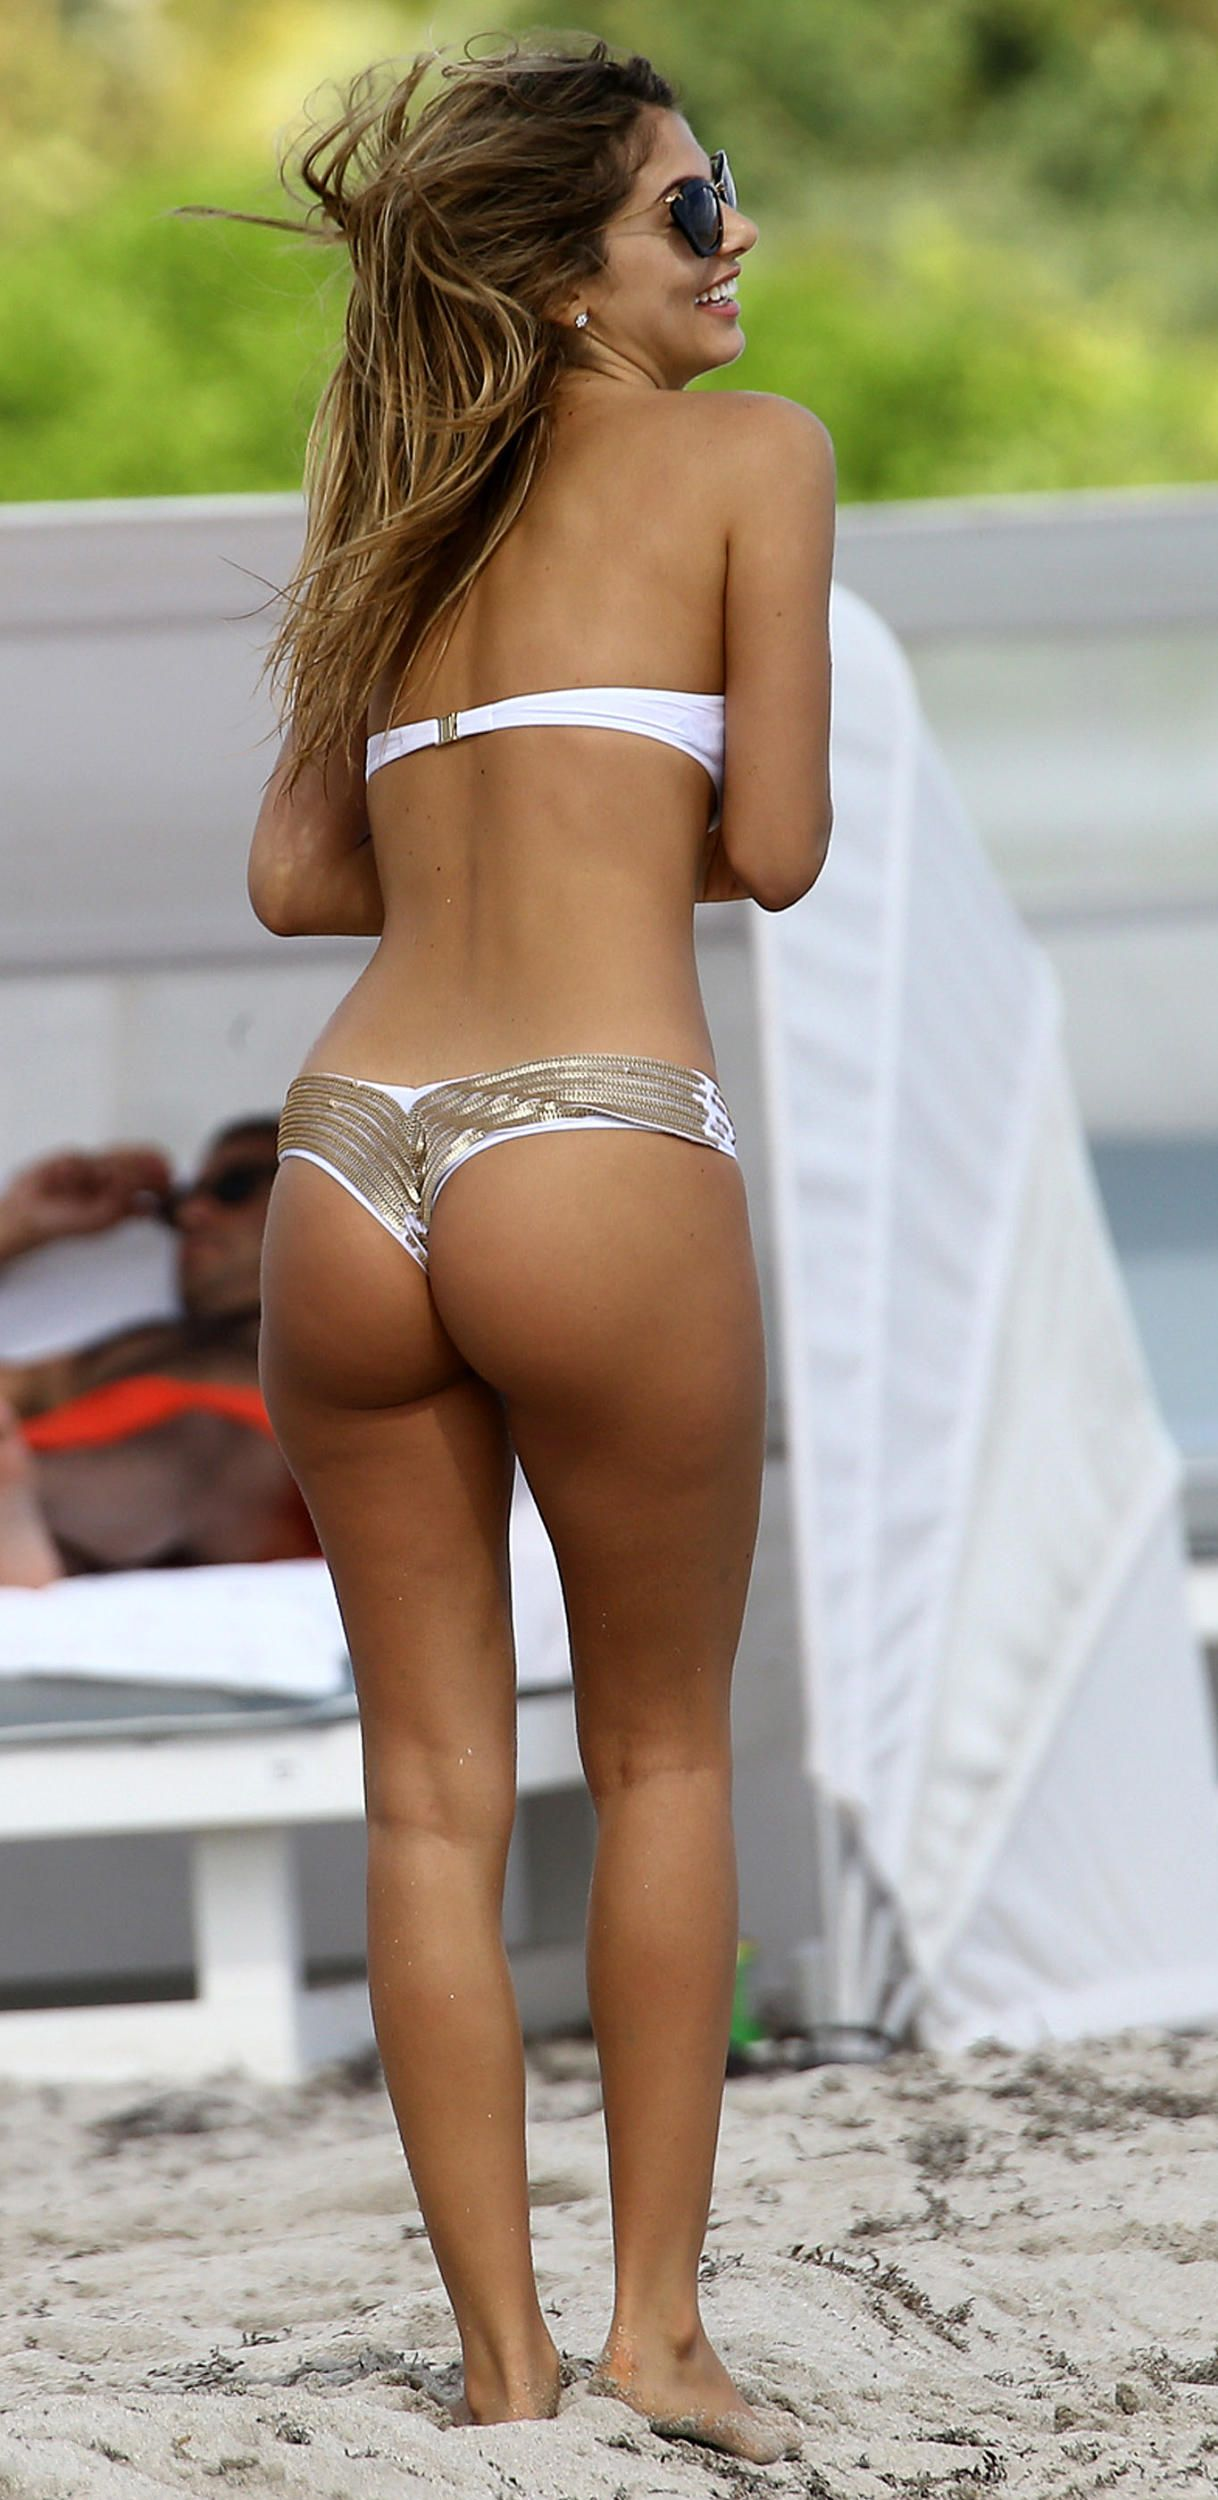 Melissa-Castagnoli-in-a-Bikini-4